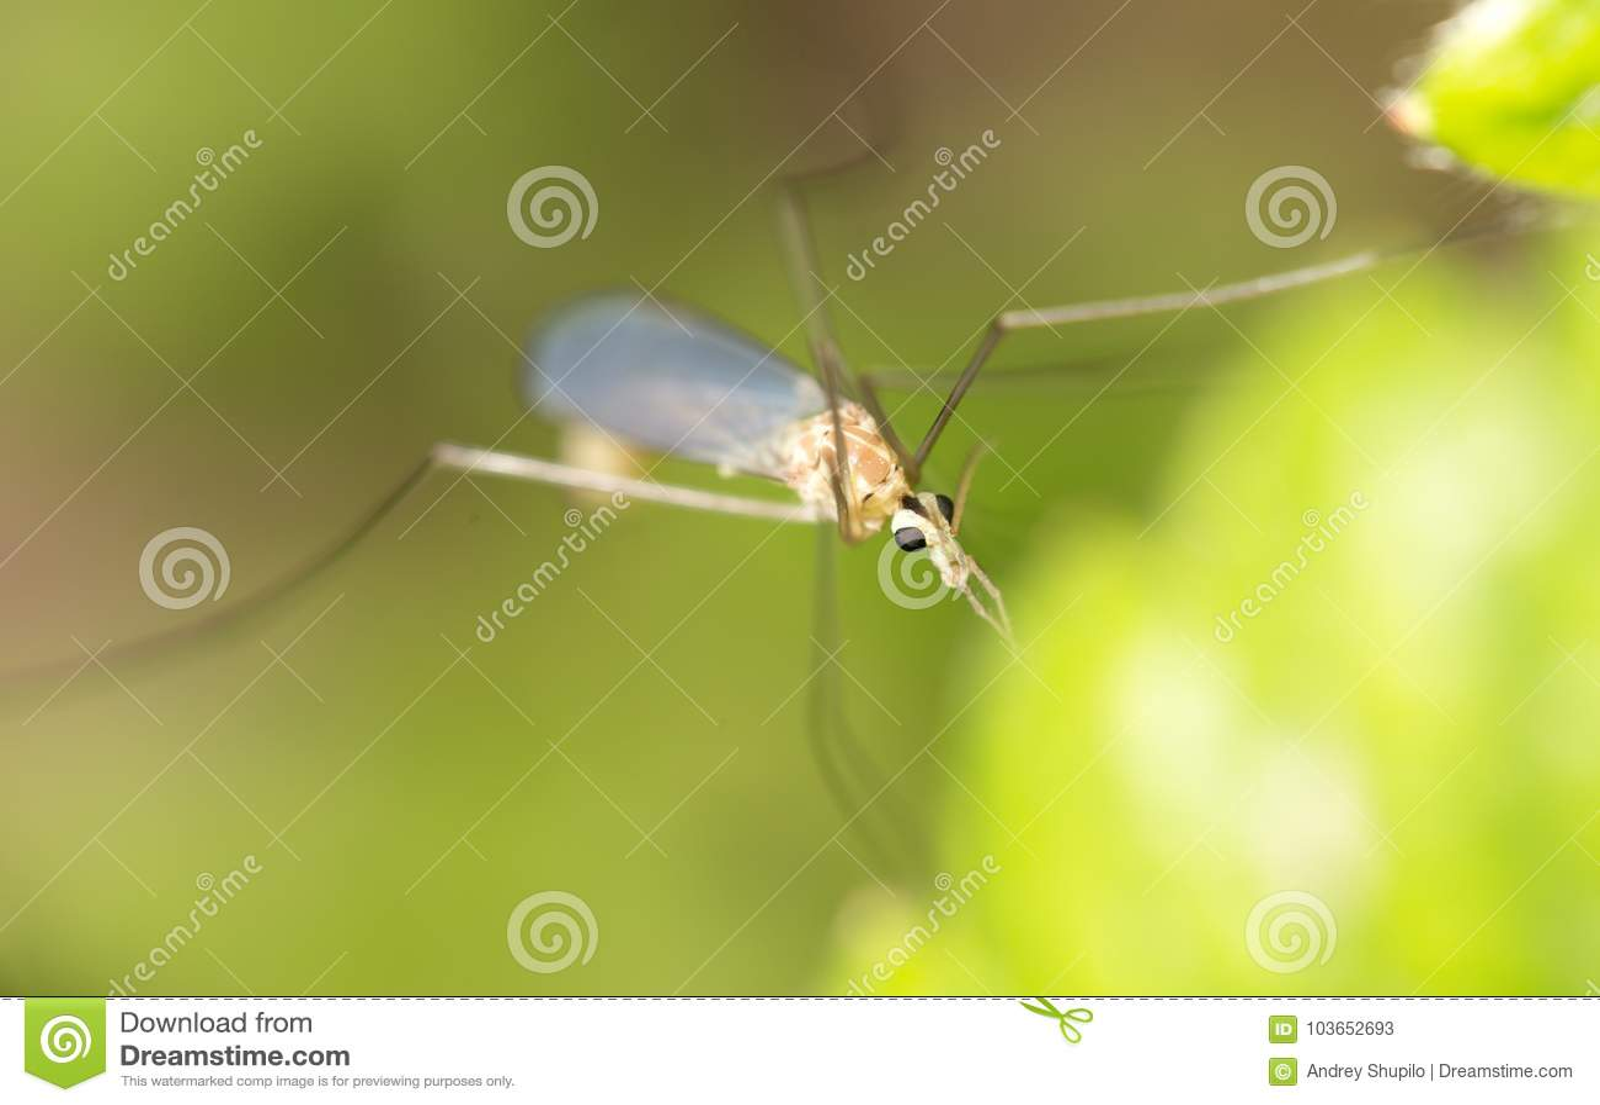 Mosquito en naturaleza Macro